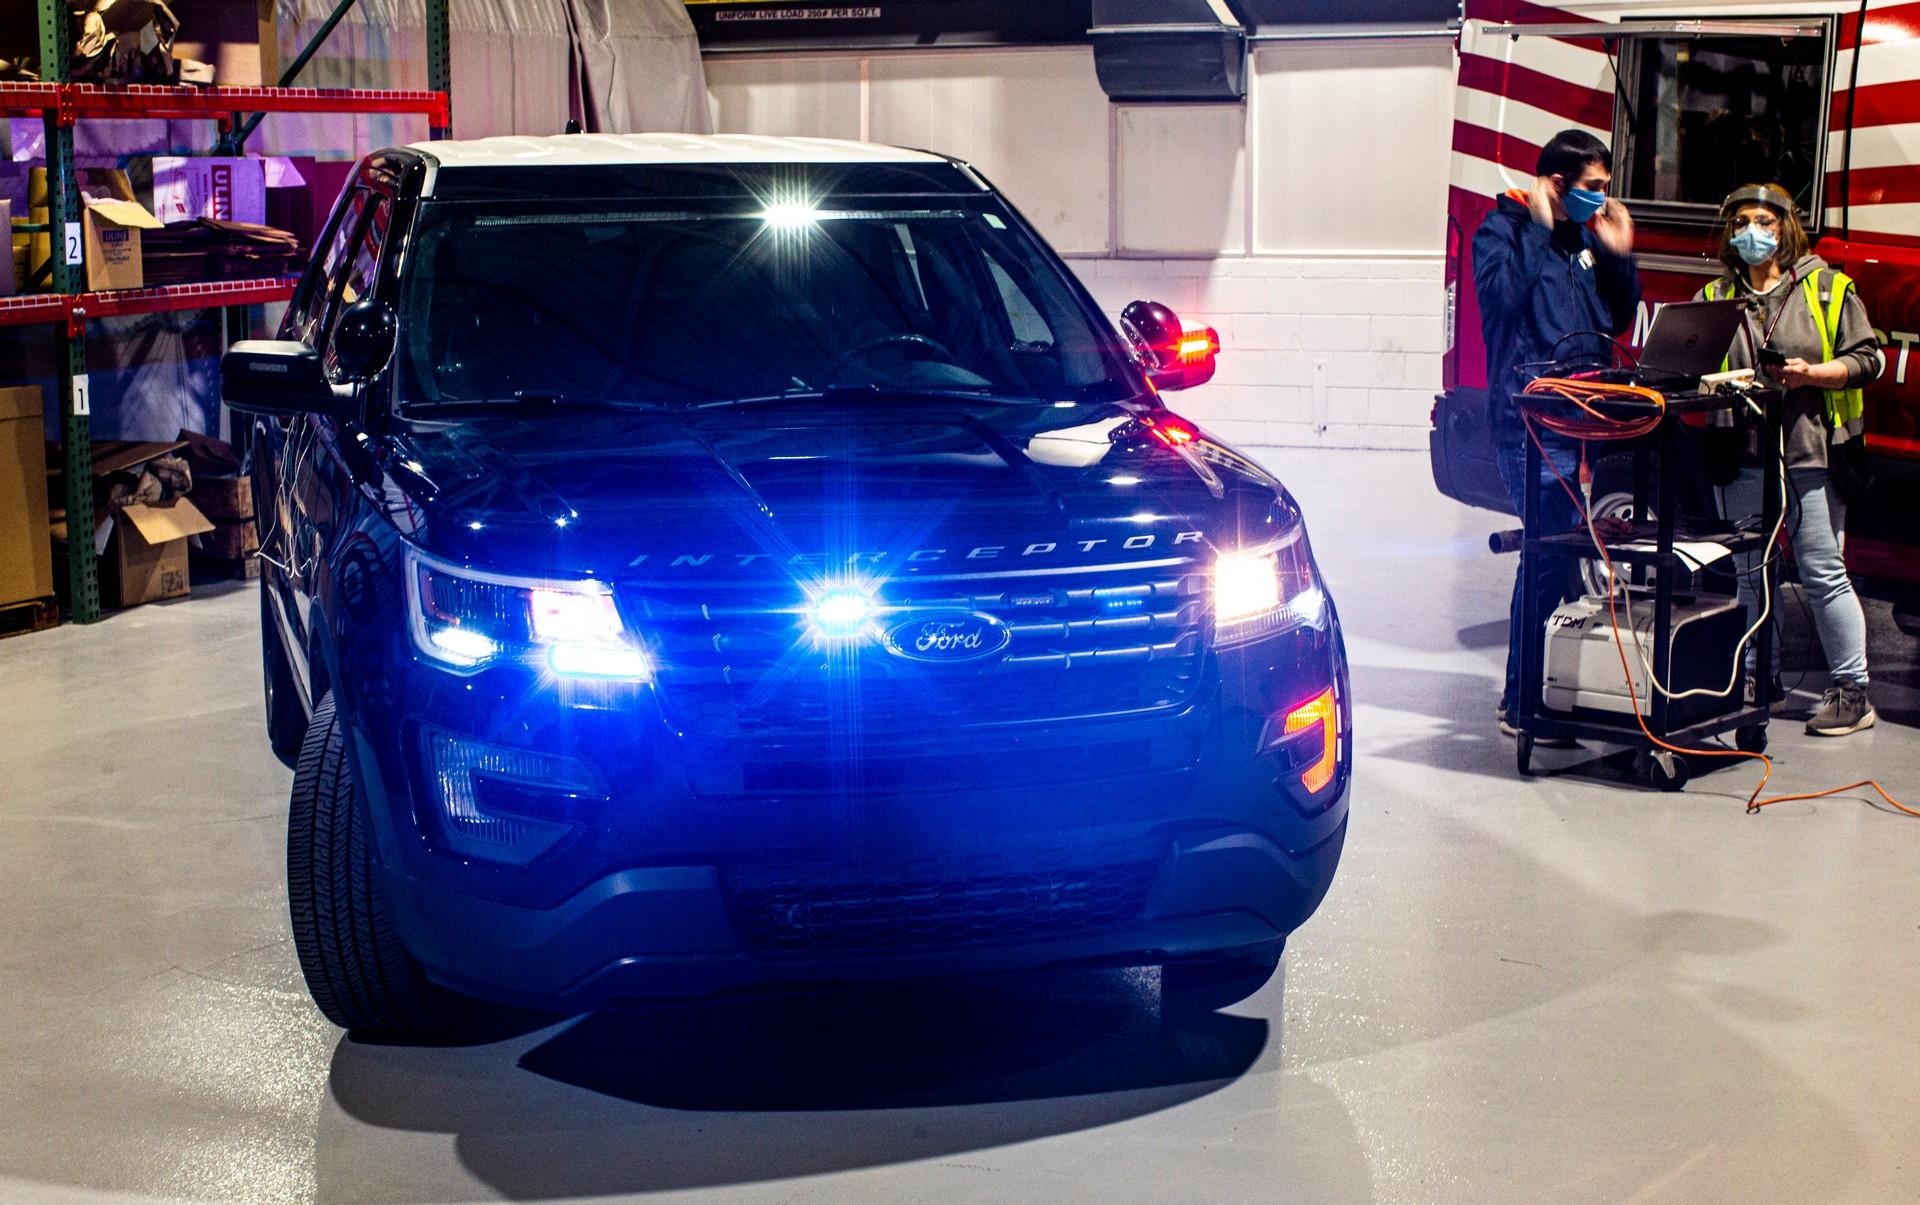 Ford-Police-Interceptor-Utility-Corona-10